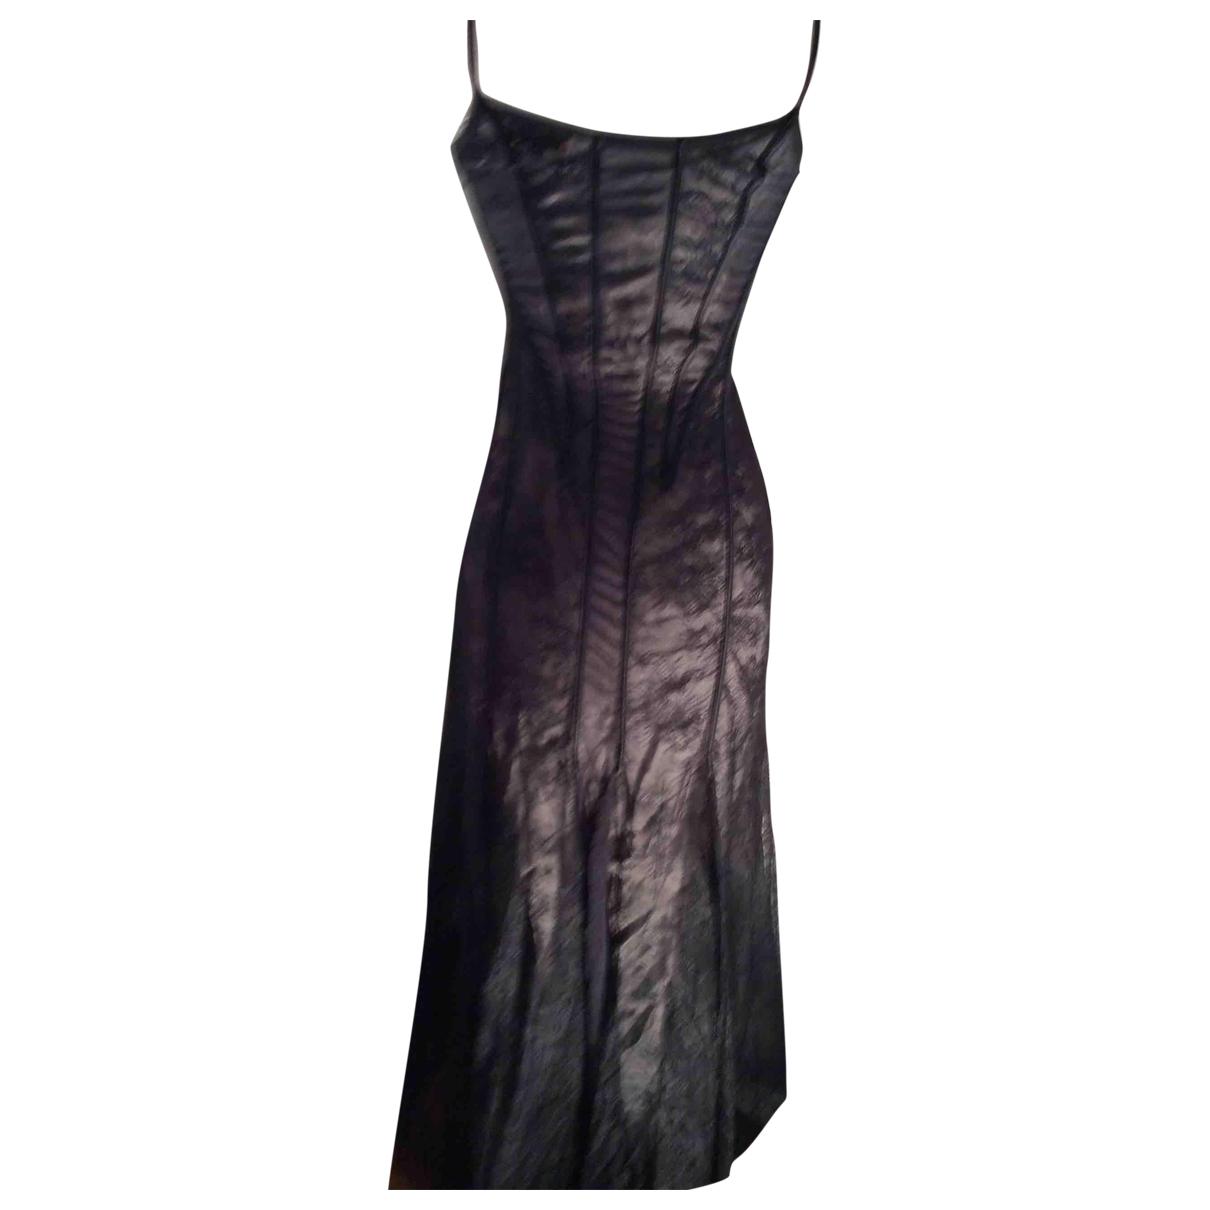 La Perla \N Kleid in  Schwarz Polyester